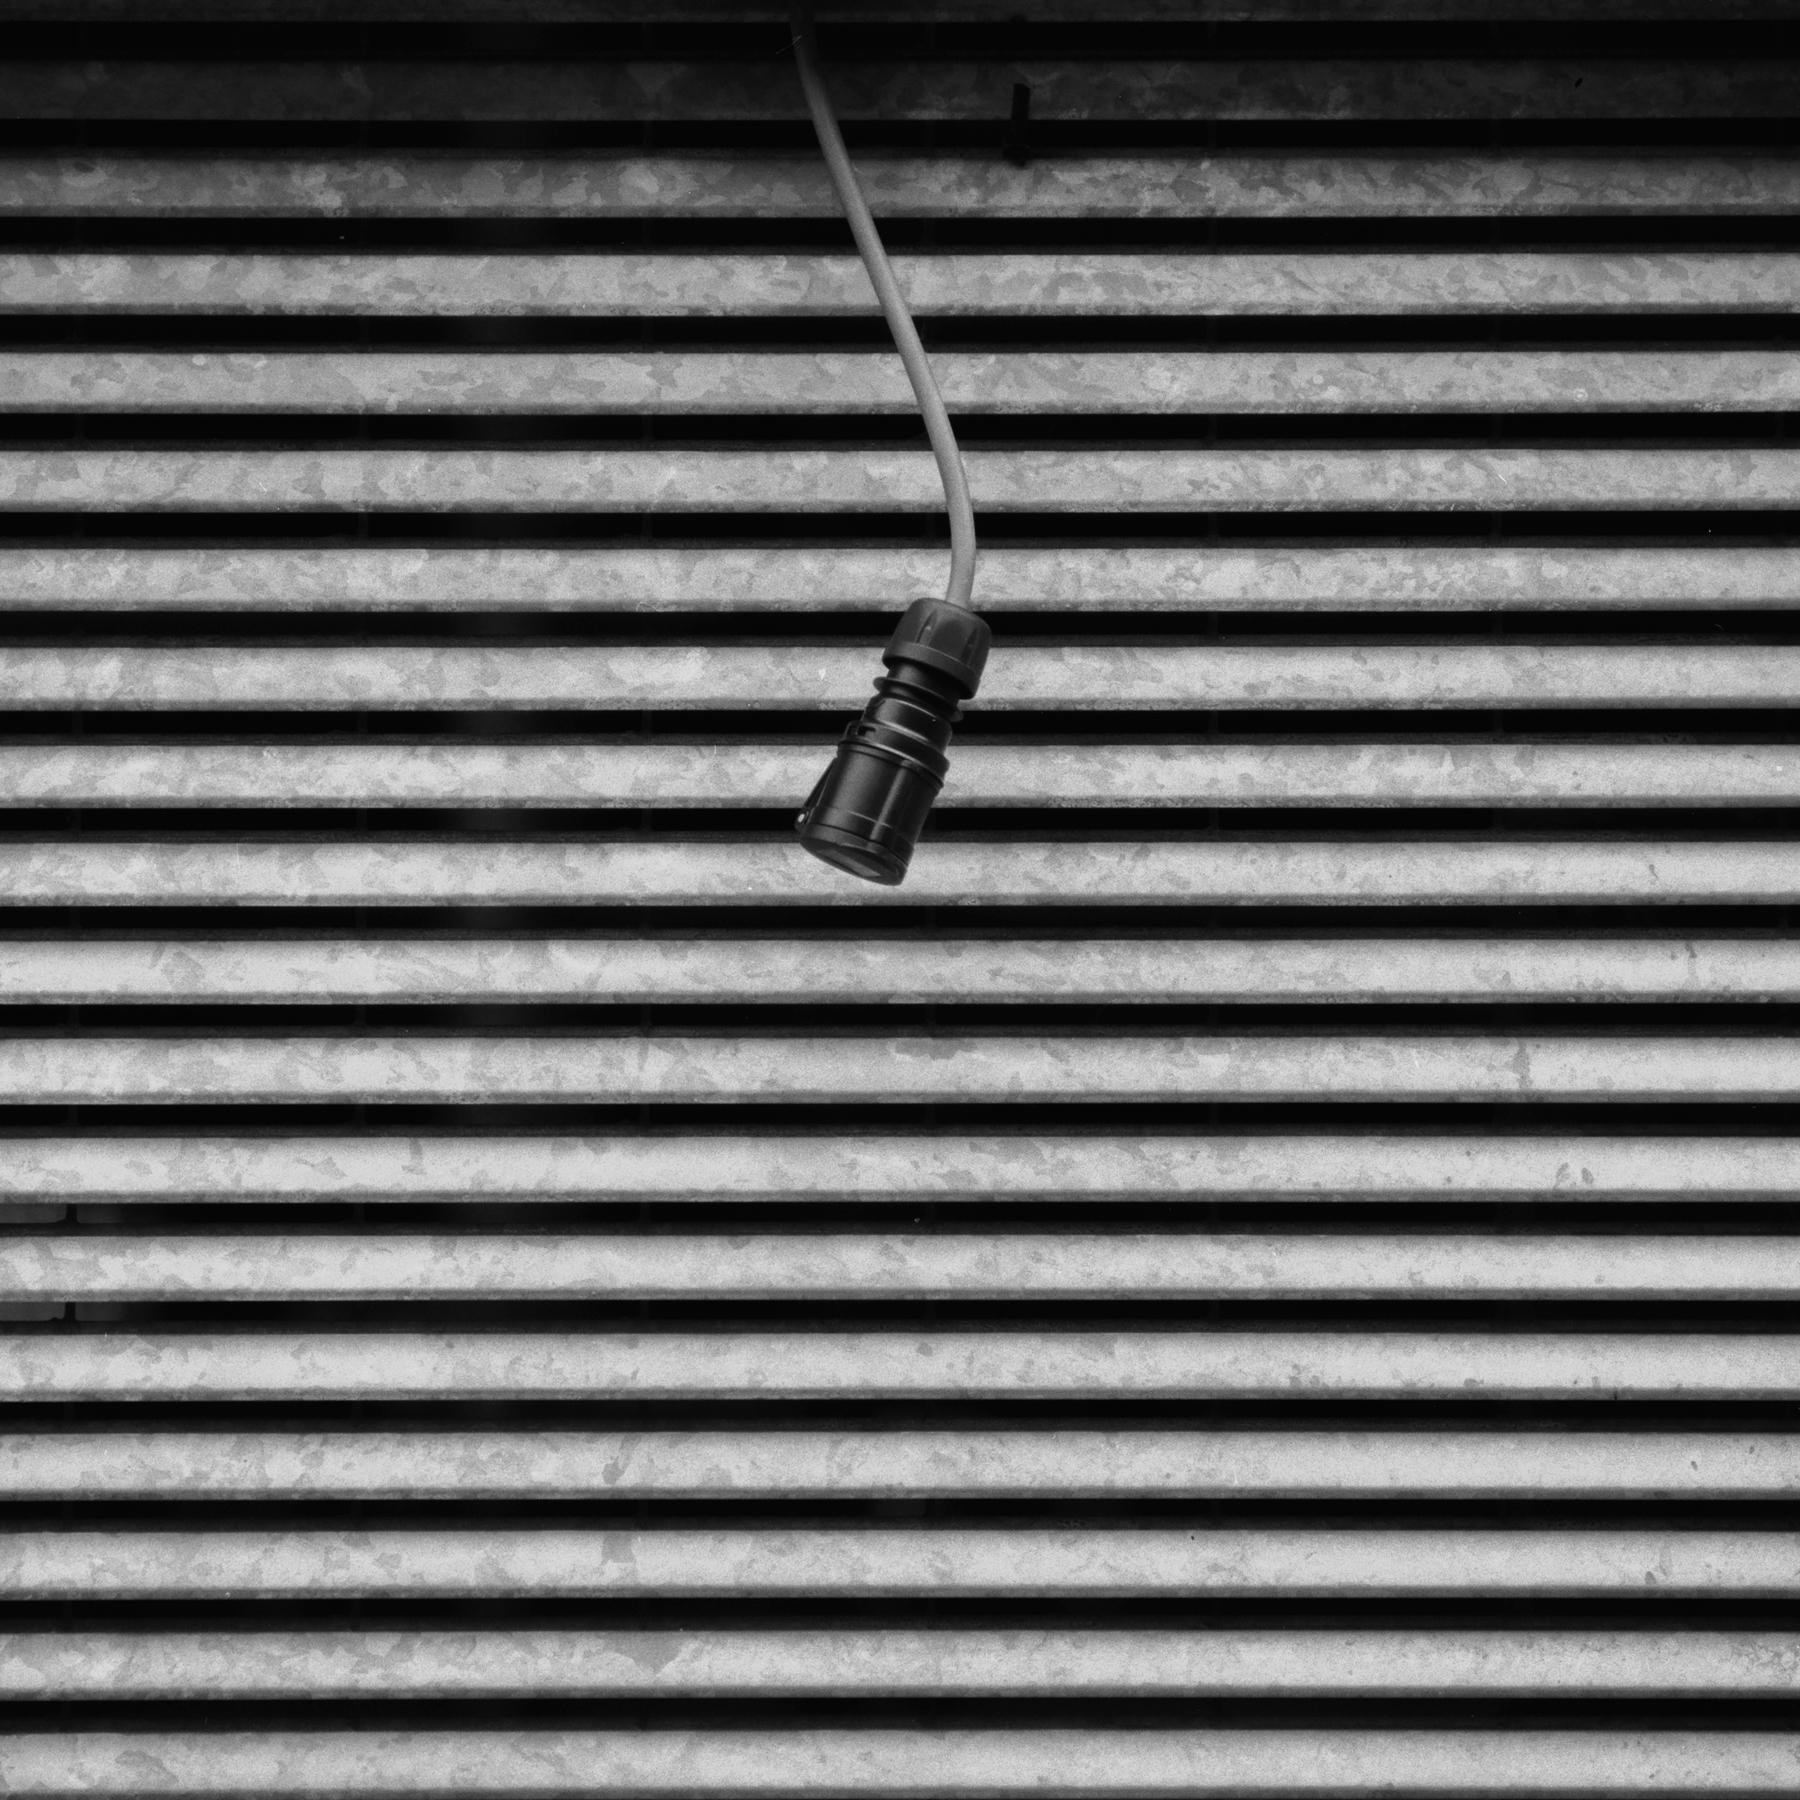 Plug | Mamiya M645 1000s | 150mm f/3.5 | Umberto Gnocchi